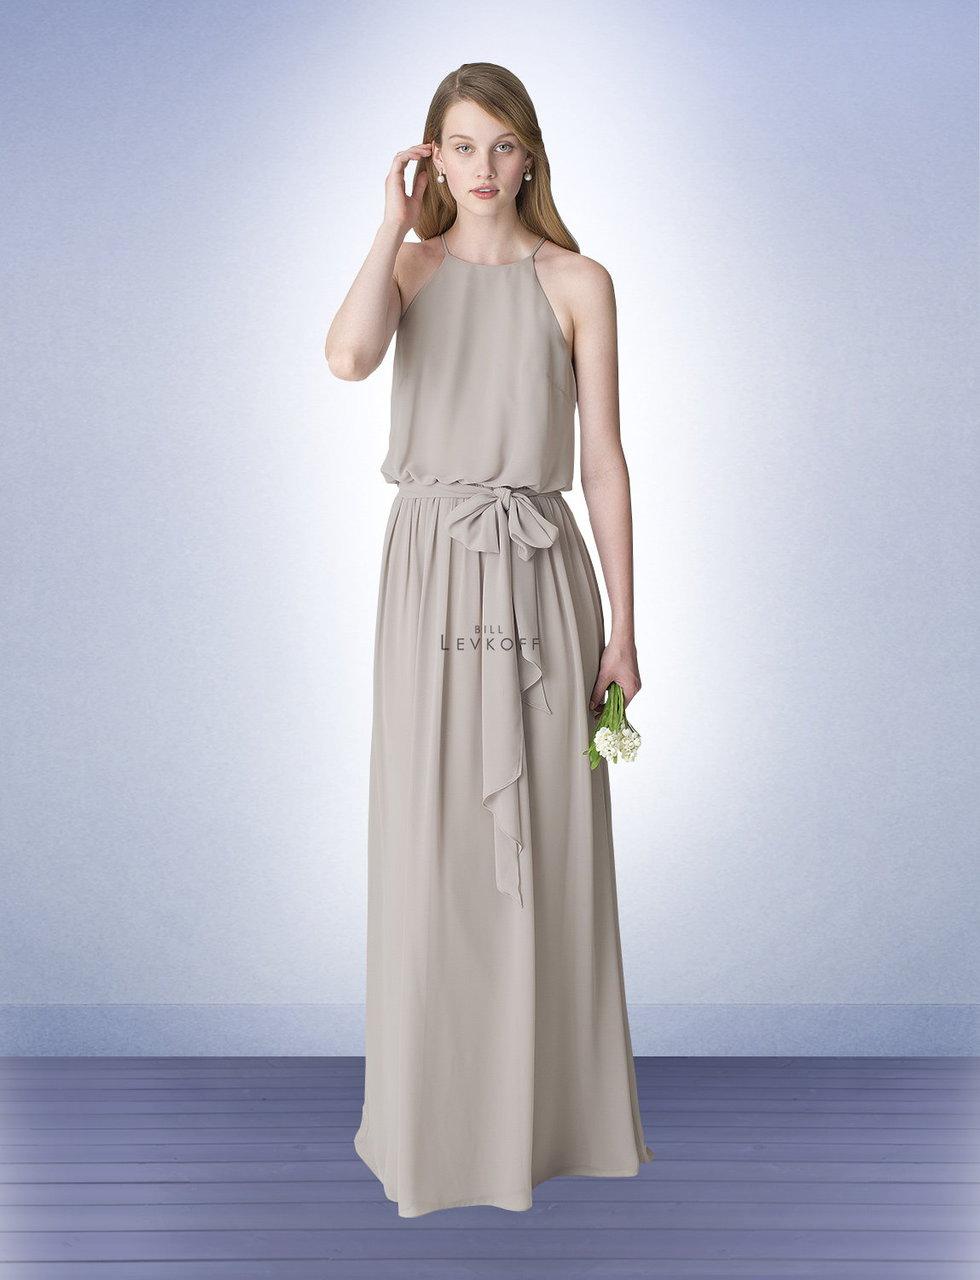 Levkoff bridesmaid dress style 1267 chiffon bill levkoff bridesmaid dress style 1267 chiffon ombrellifo Image collections